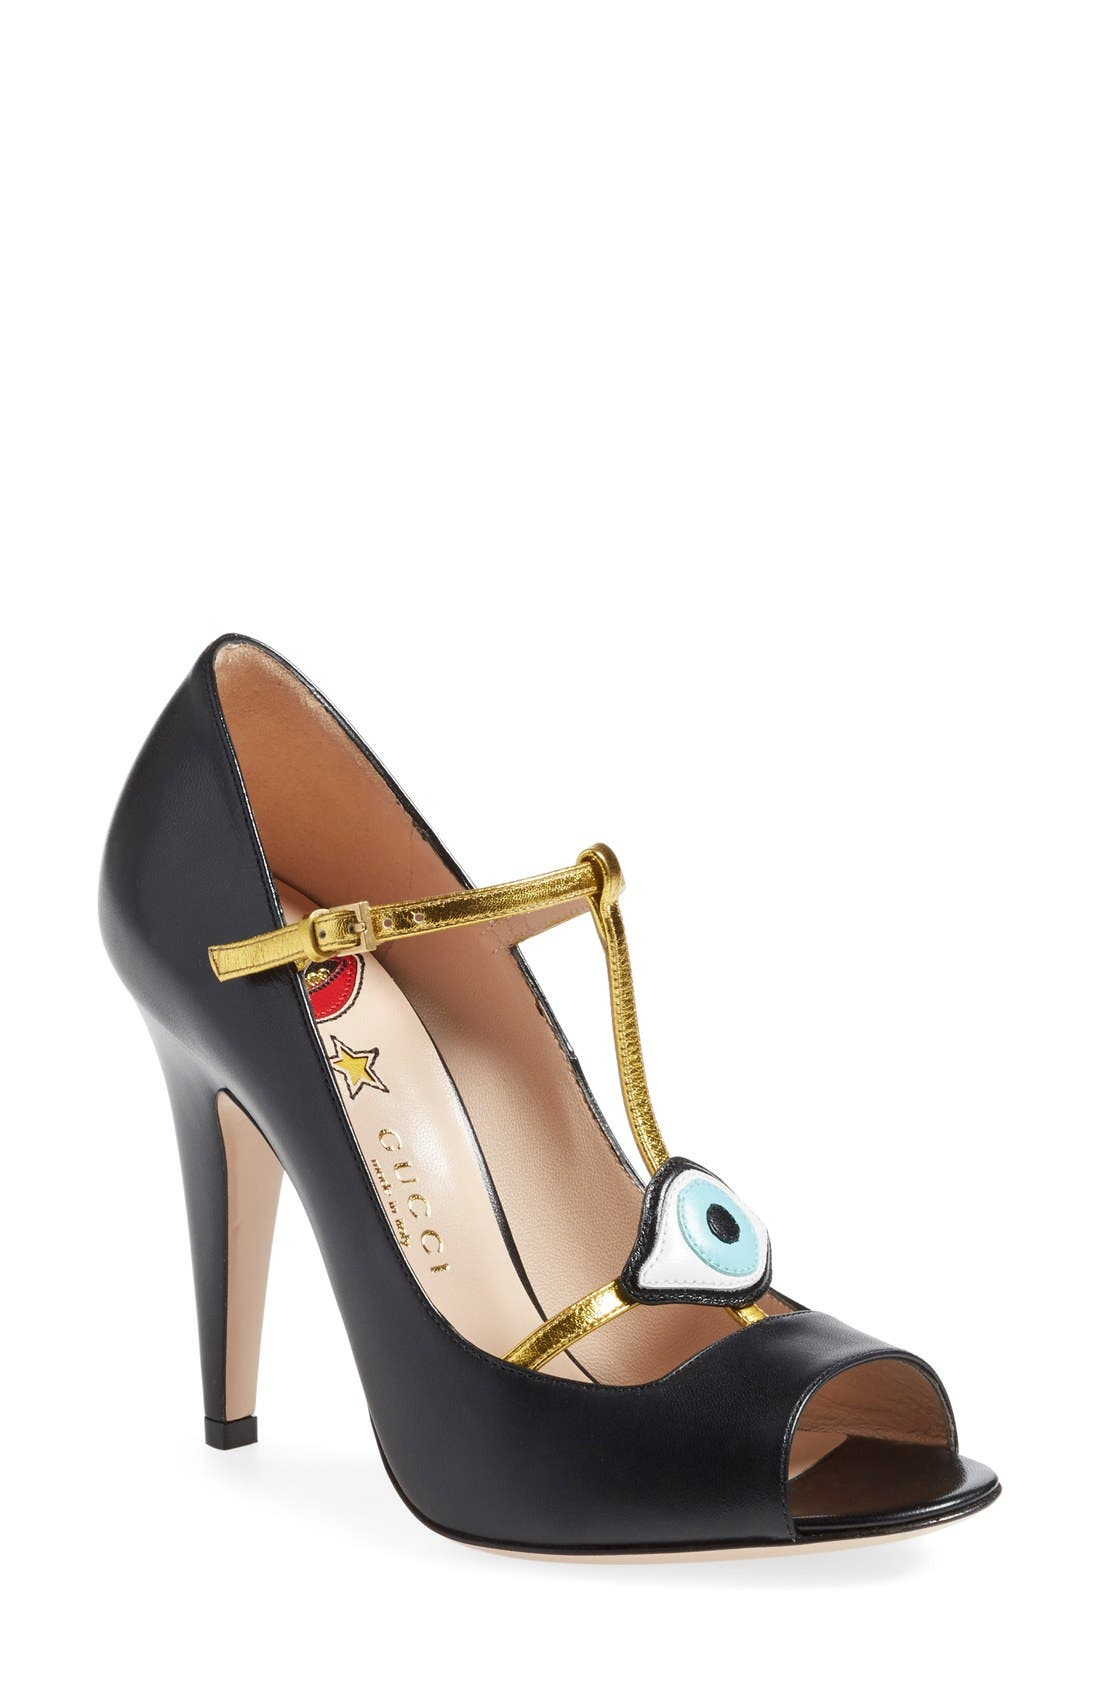 Alternate Image 1 Selected - Gucci 'Molina' T-Strap Peep Toe Pump (Women)